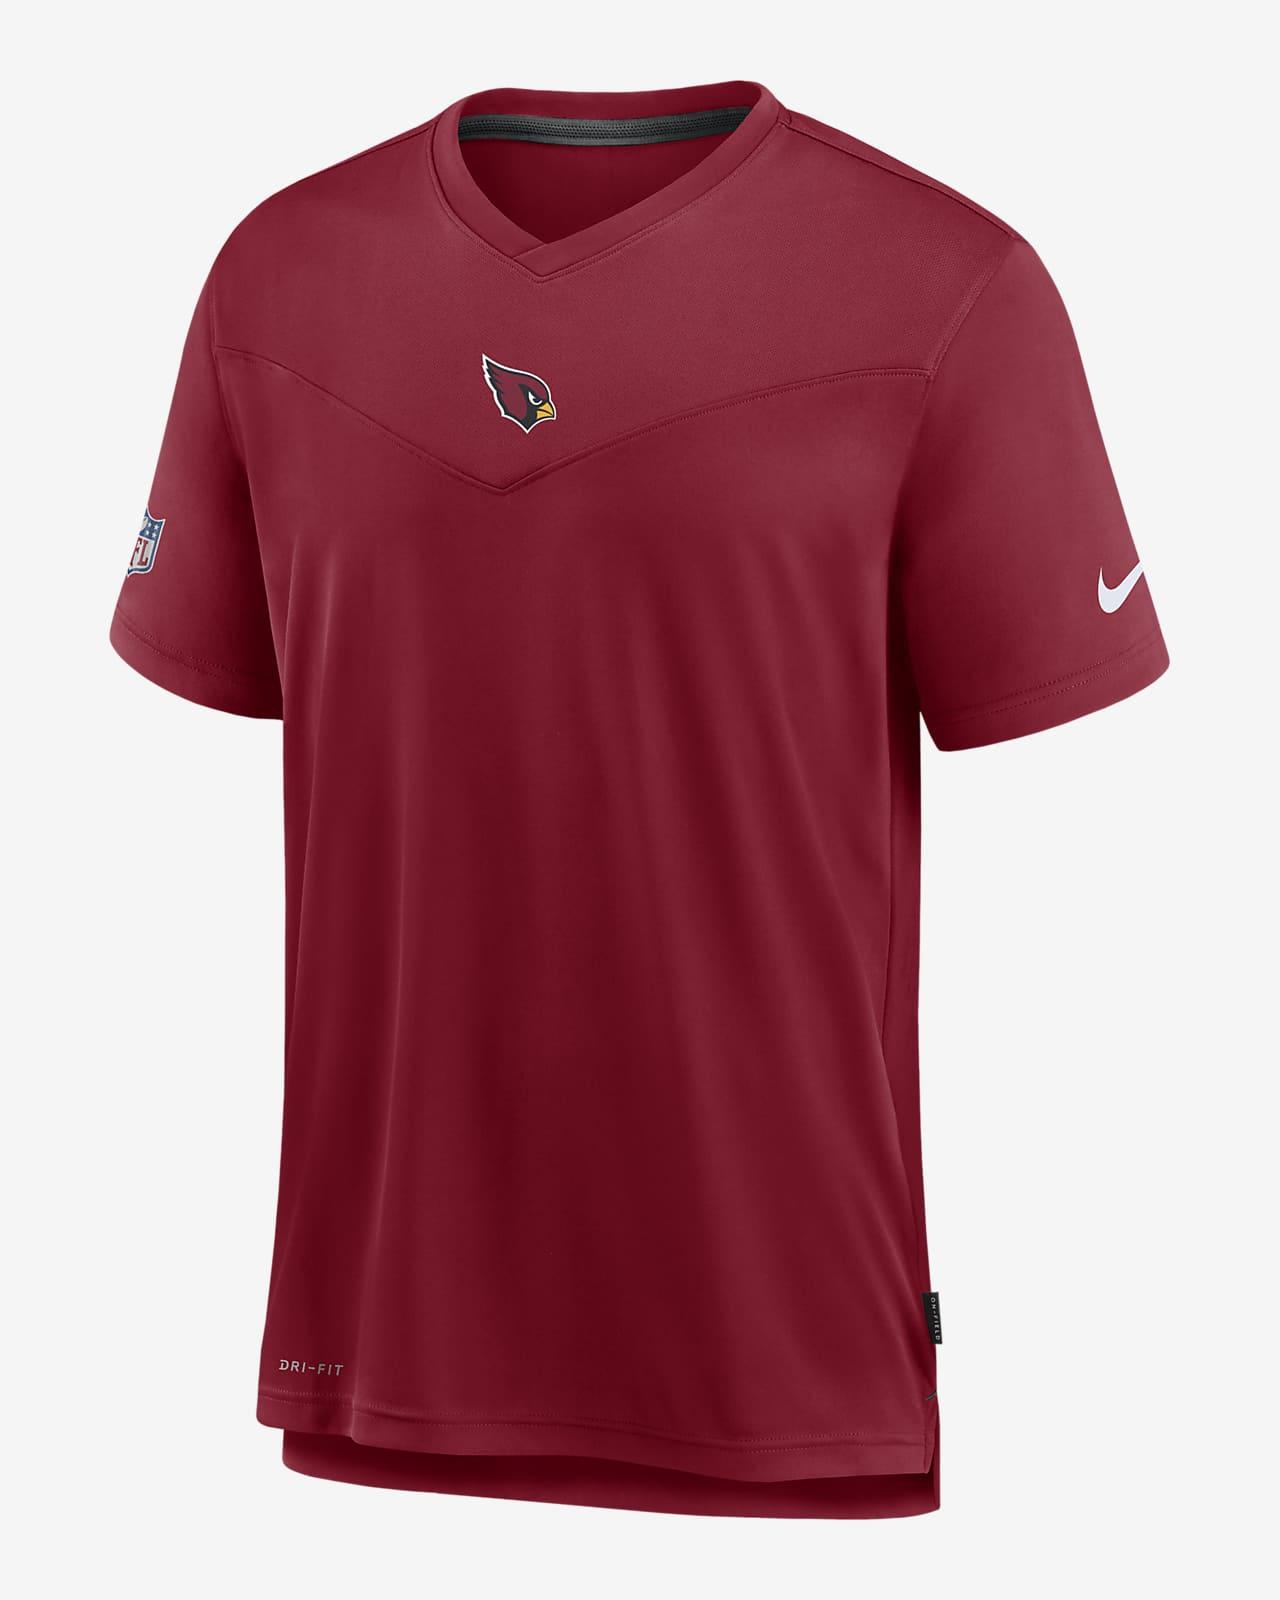 Nike Dri-FIT Sideline Coaches (NFL Arizona Cardinals) Men's V-Neck T-Shirt